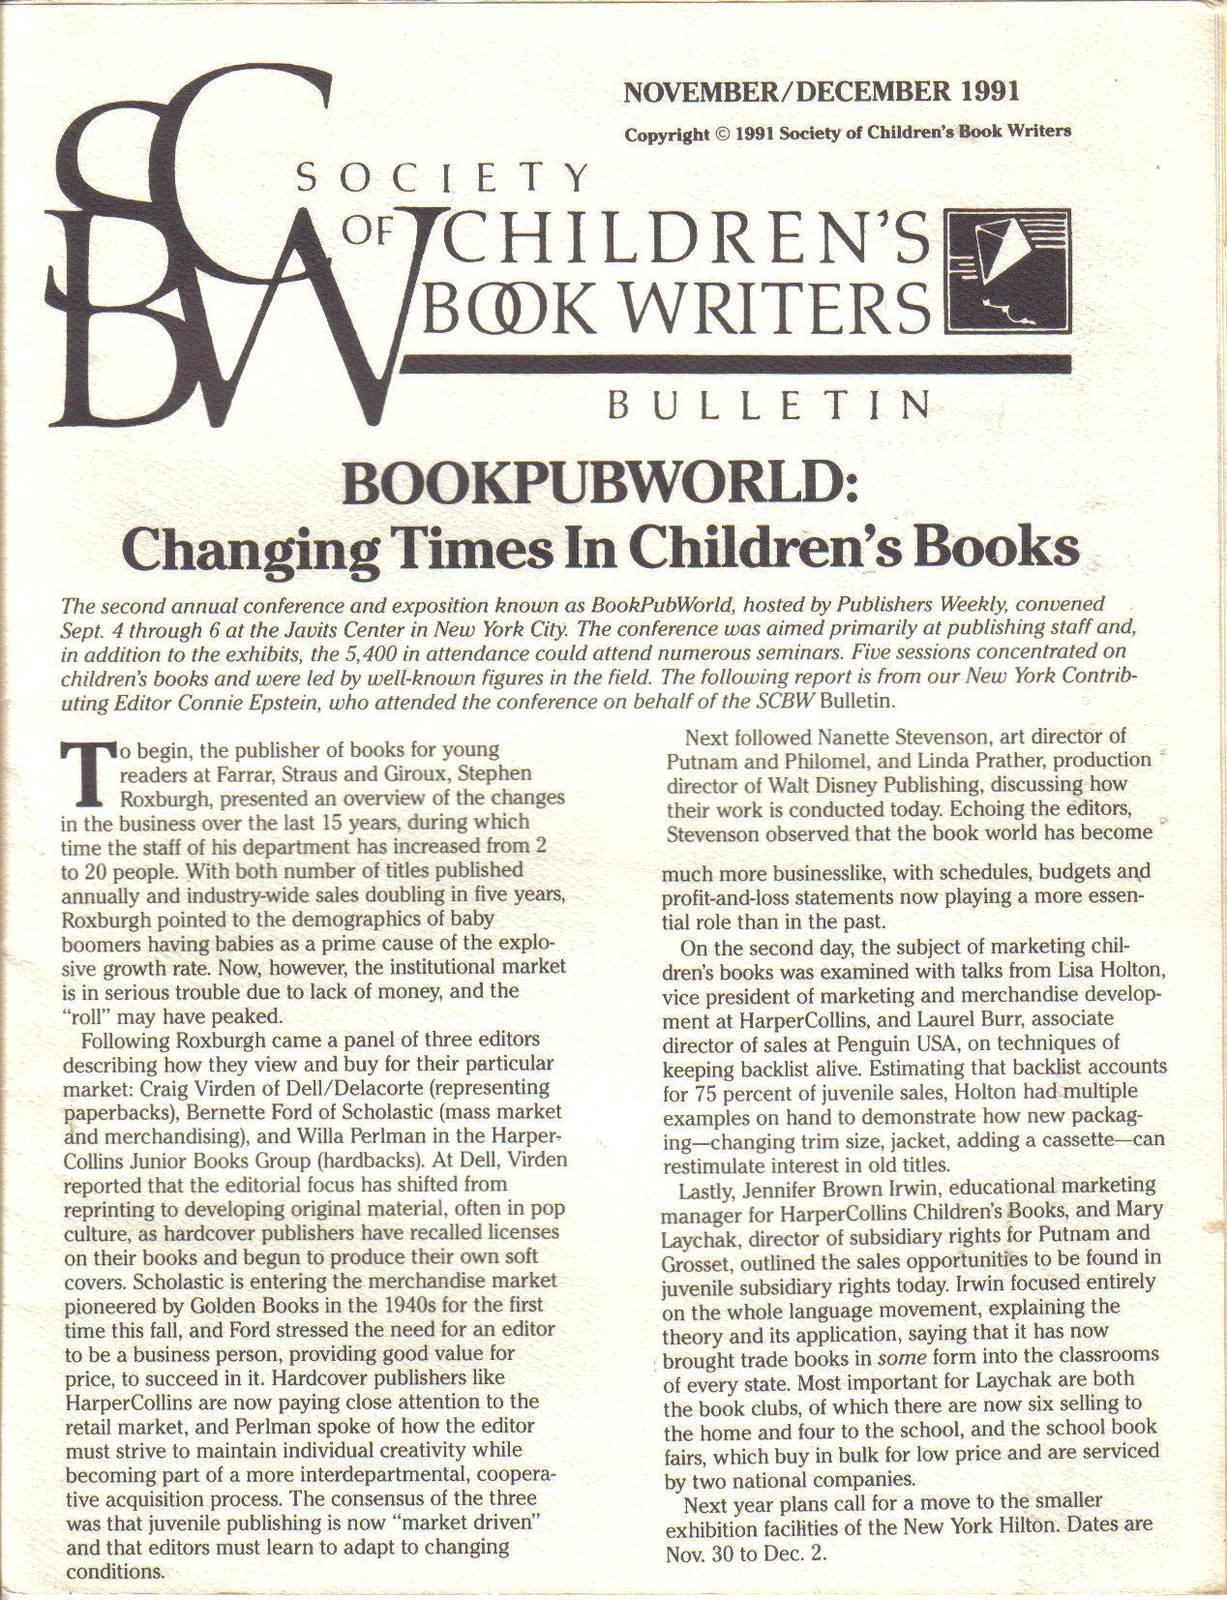 (7) SOCIETY OF CHILDREN'S BOOK WRITERS & ILLUSTRATORS image 14